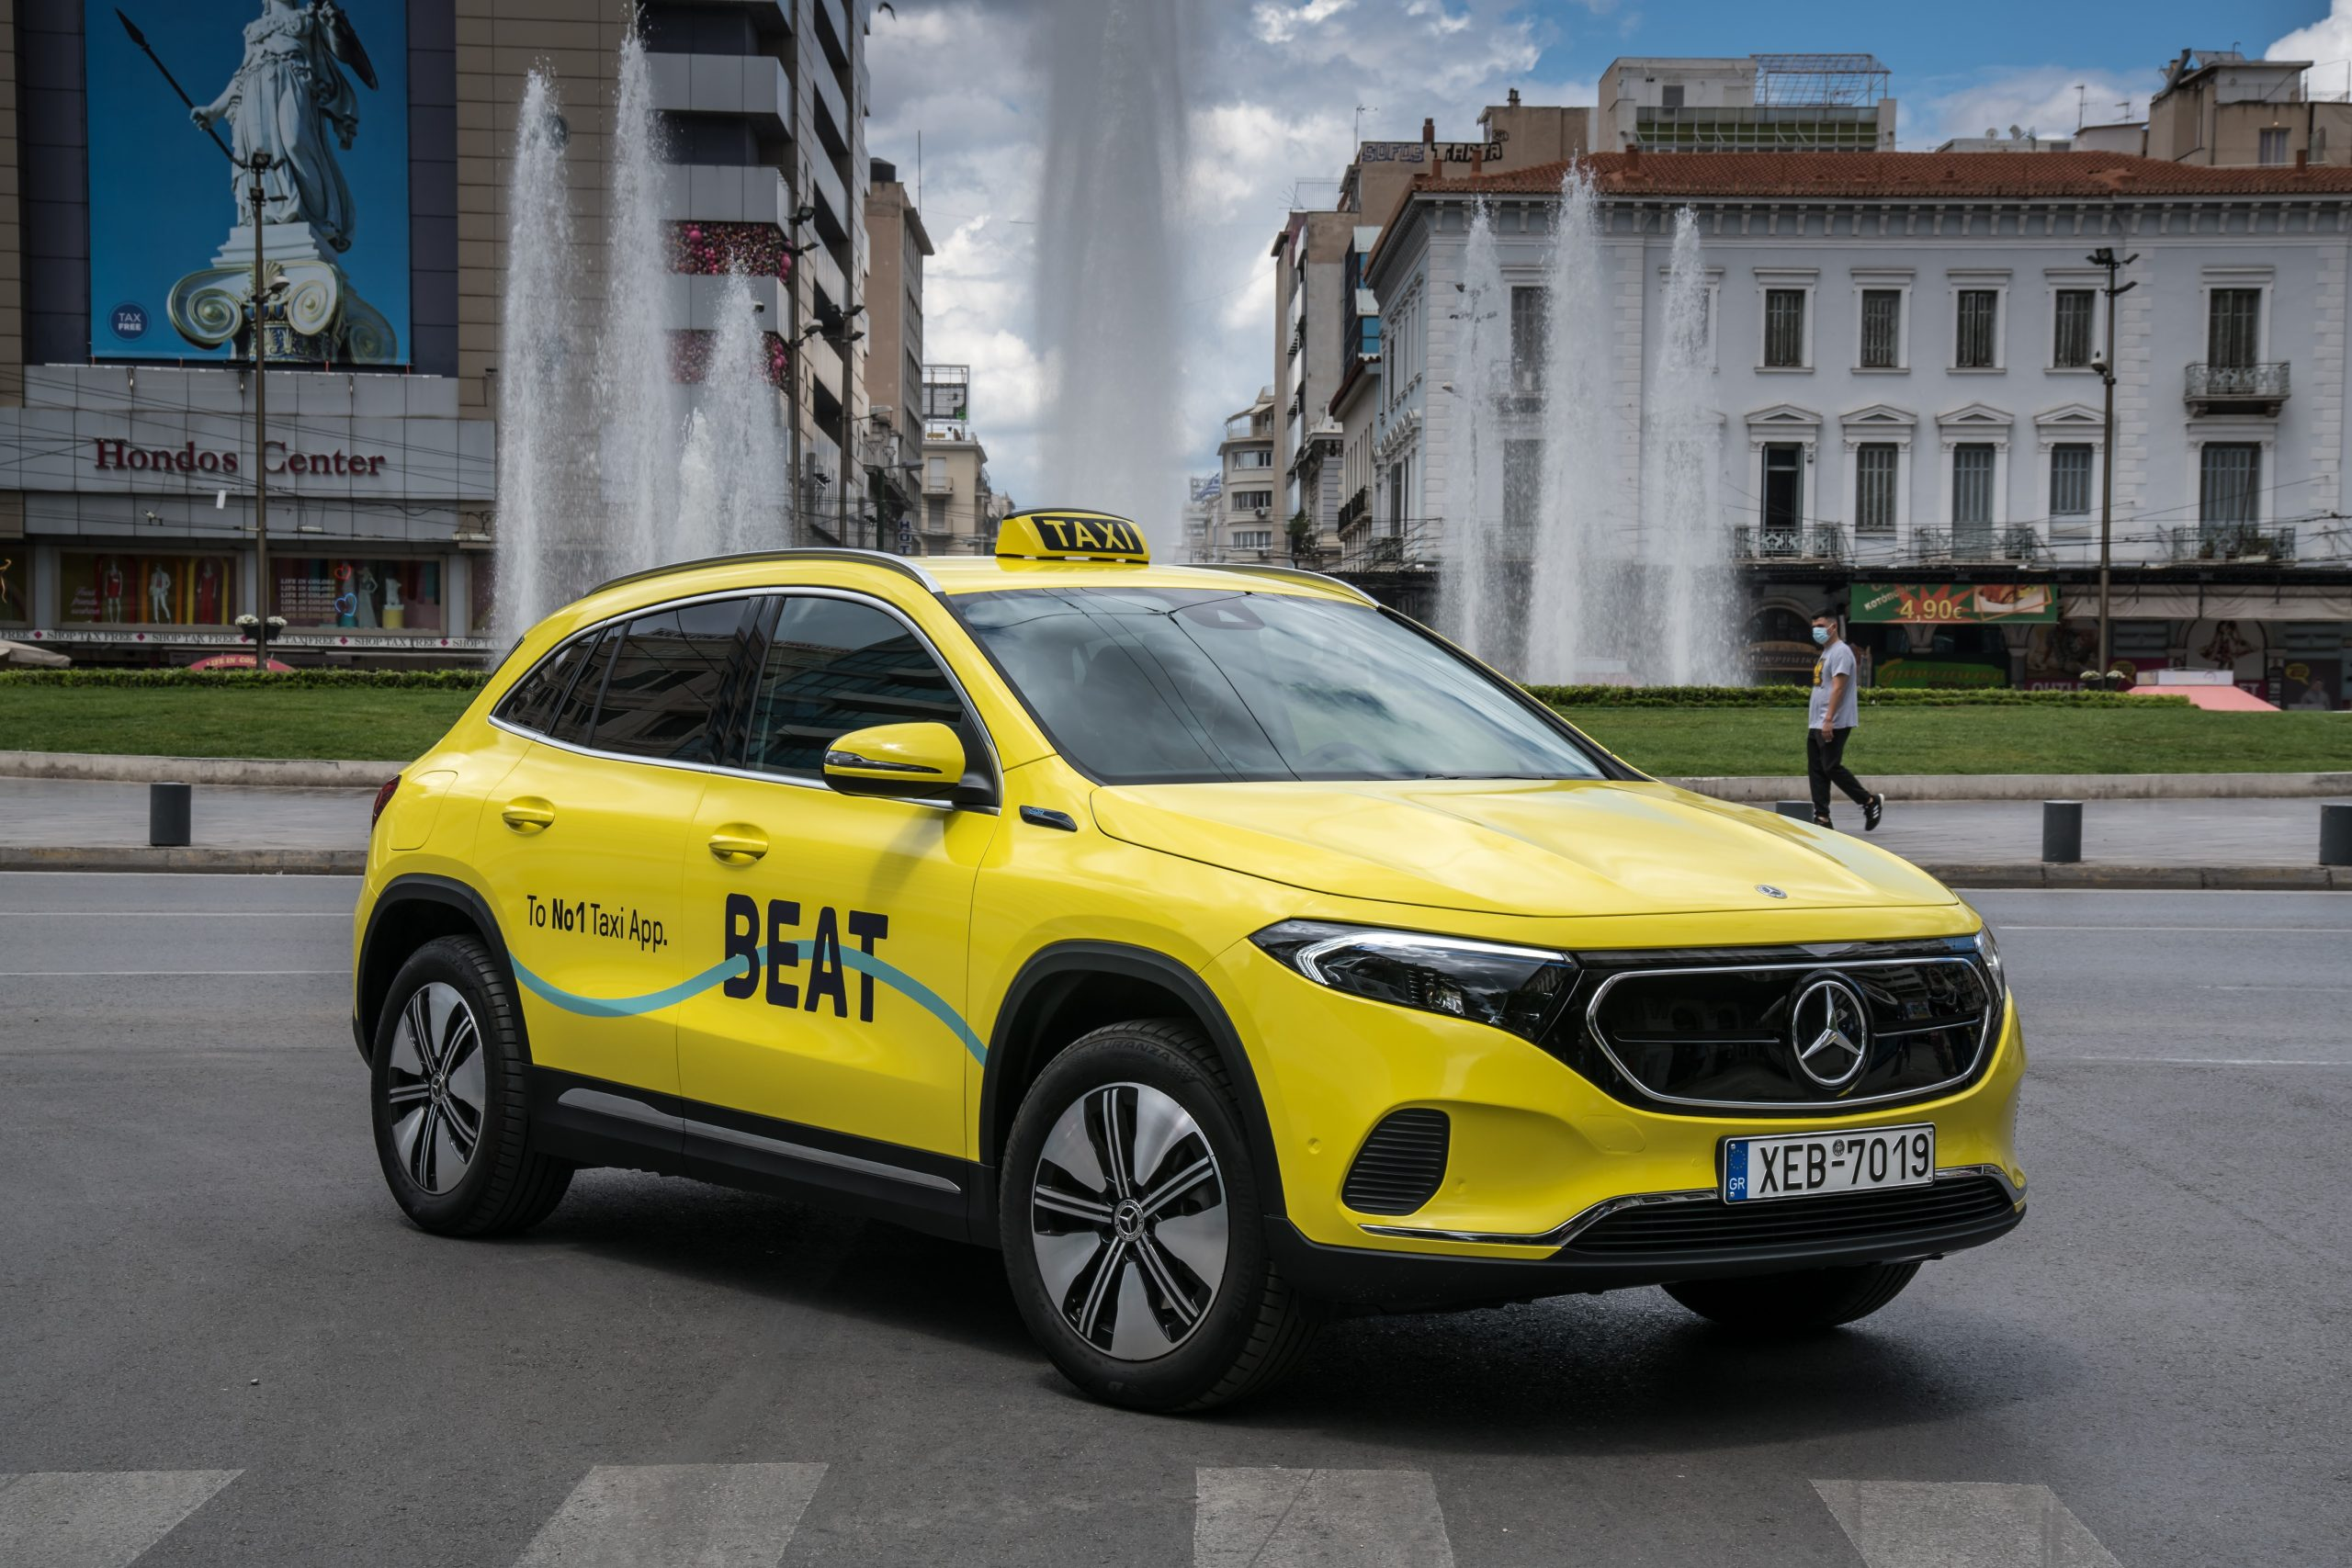 BEAT 0053 scaled ΒΕΑΤ : Μηδενικό αποτύπωμα ρύπων έως το 2025 BEAT, Electric cars, electric vehicles, ειδήσεις, ηλεκτρικά, ηλεκτροκινηση, κινουμαι ηλεκτρικα, Νέα, ταξί